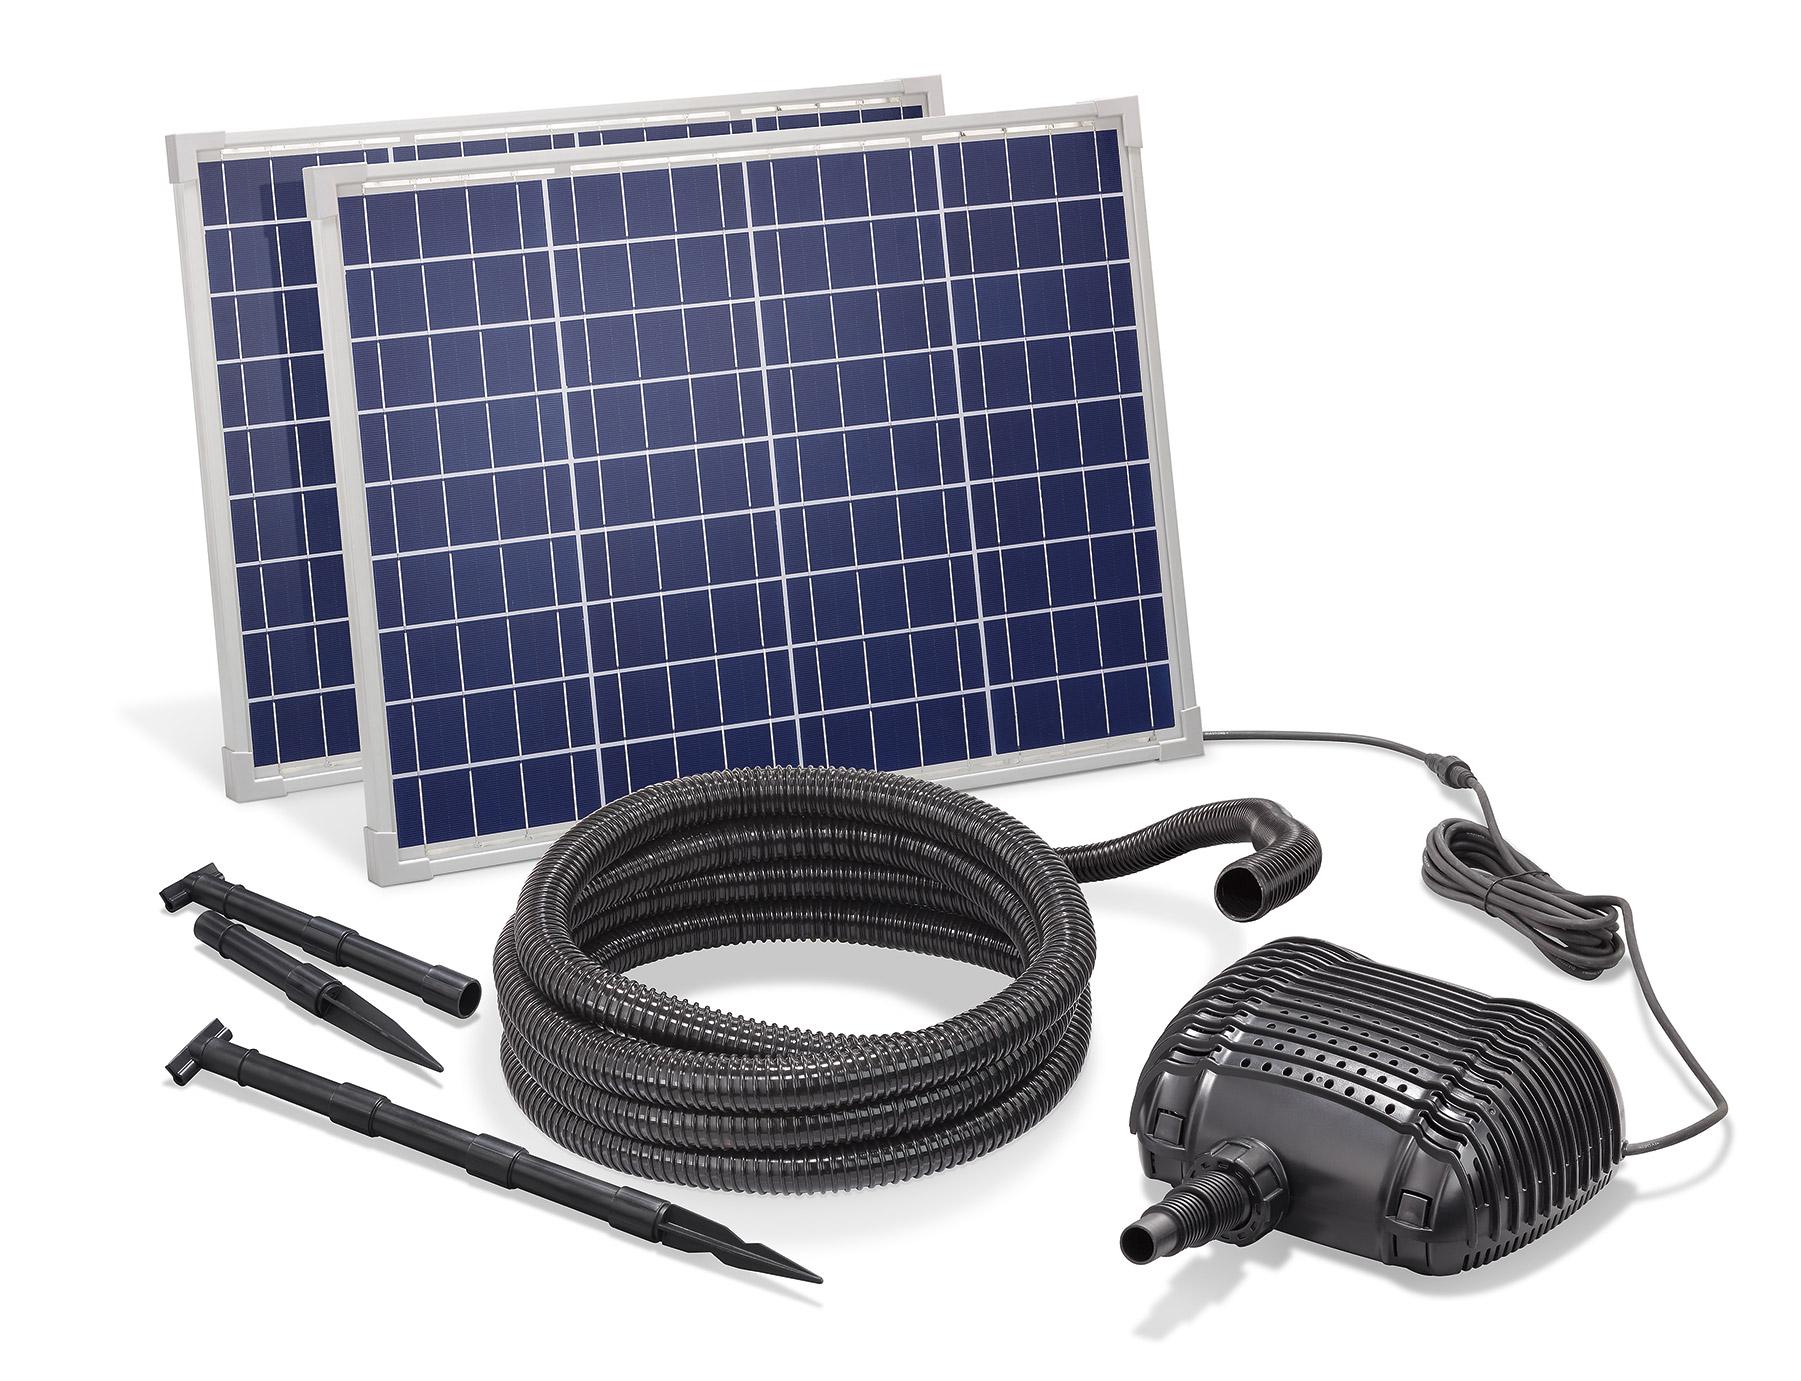 solar bachlaufpumpe 100w 3400l h solarpumpe wasserfall. Black Bedroom Furniture Sets. Home Design Ideas